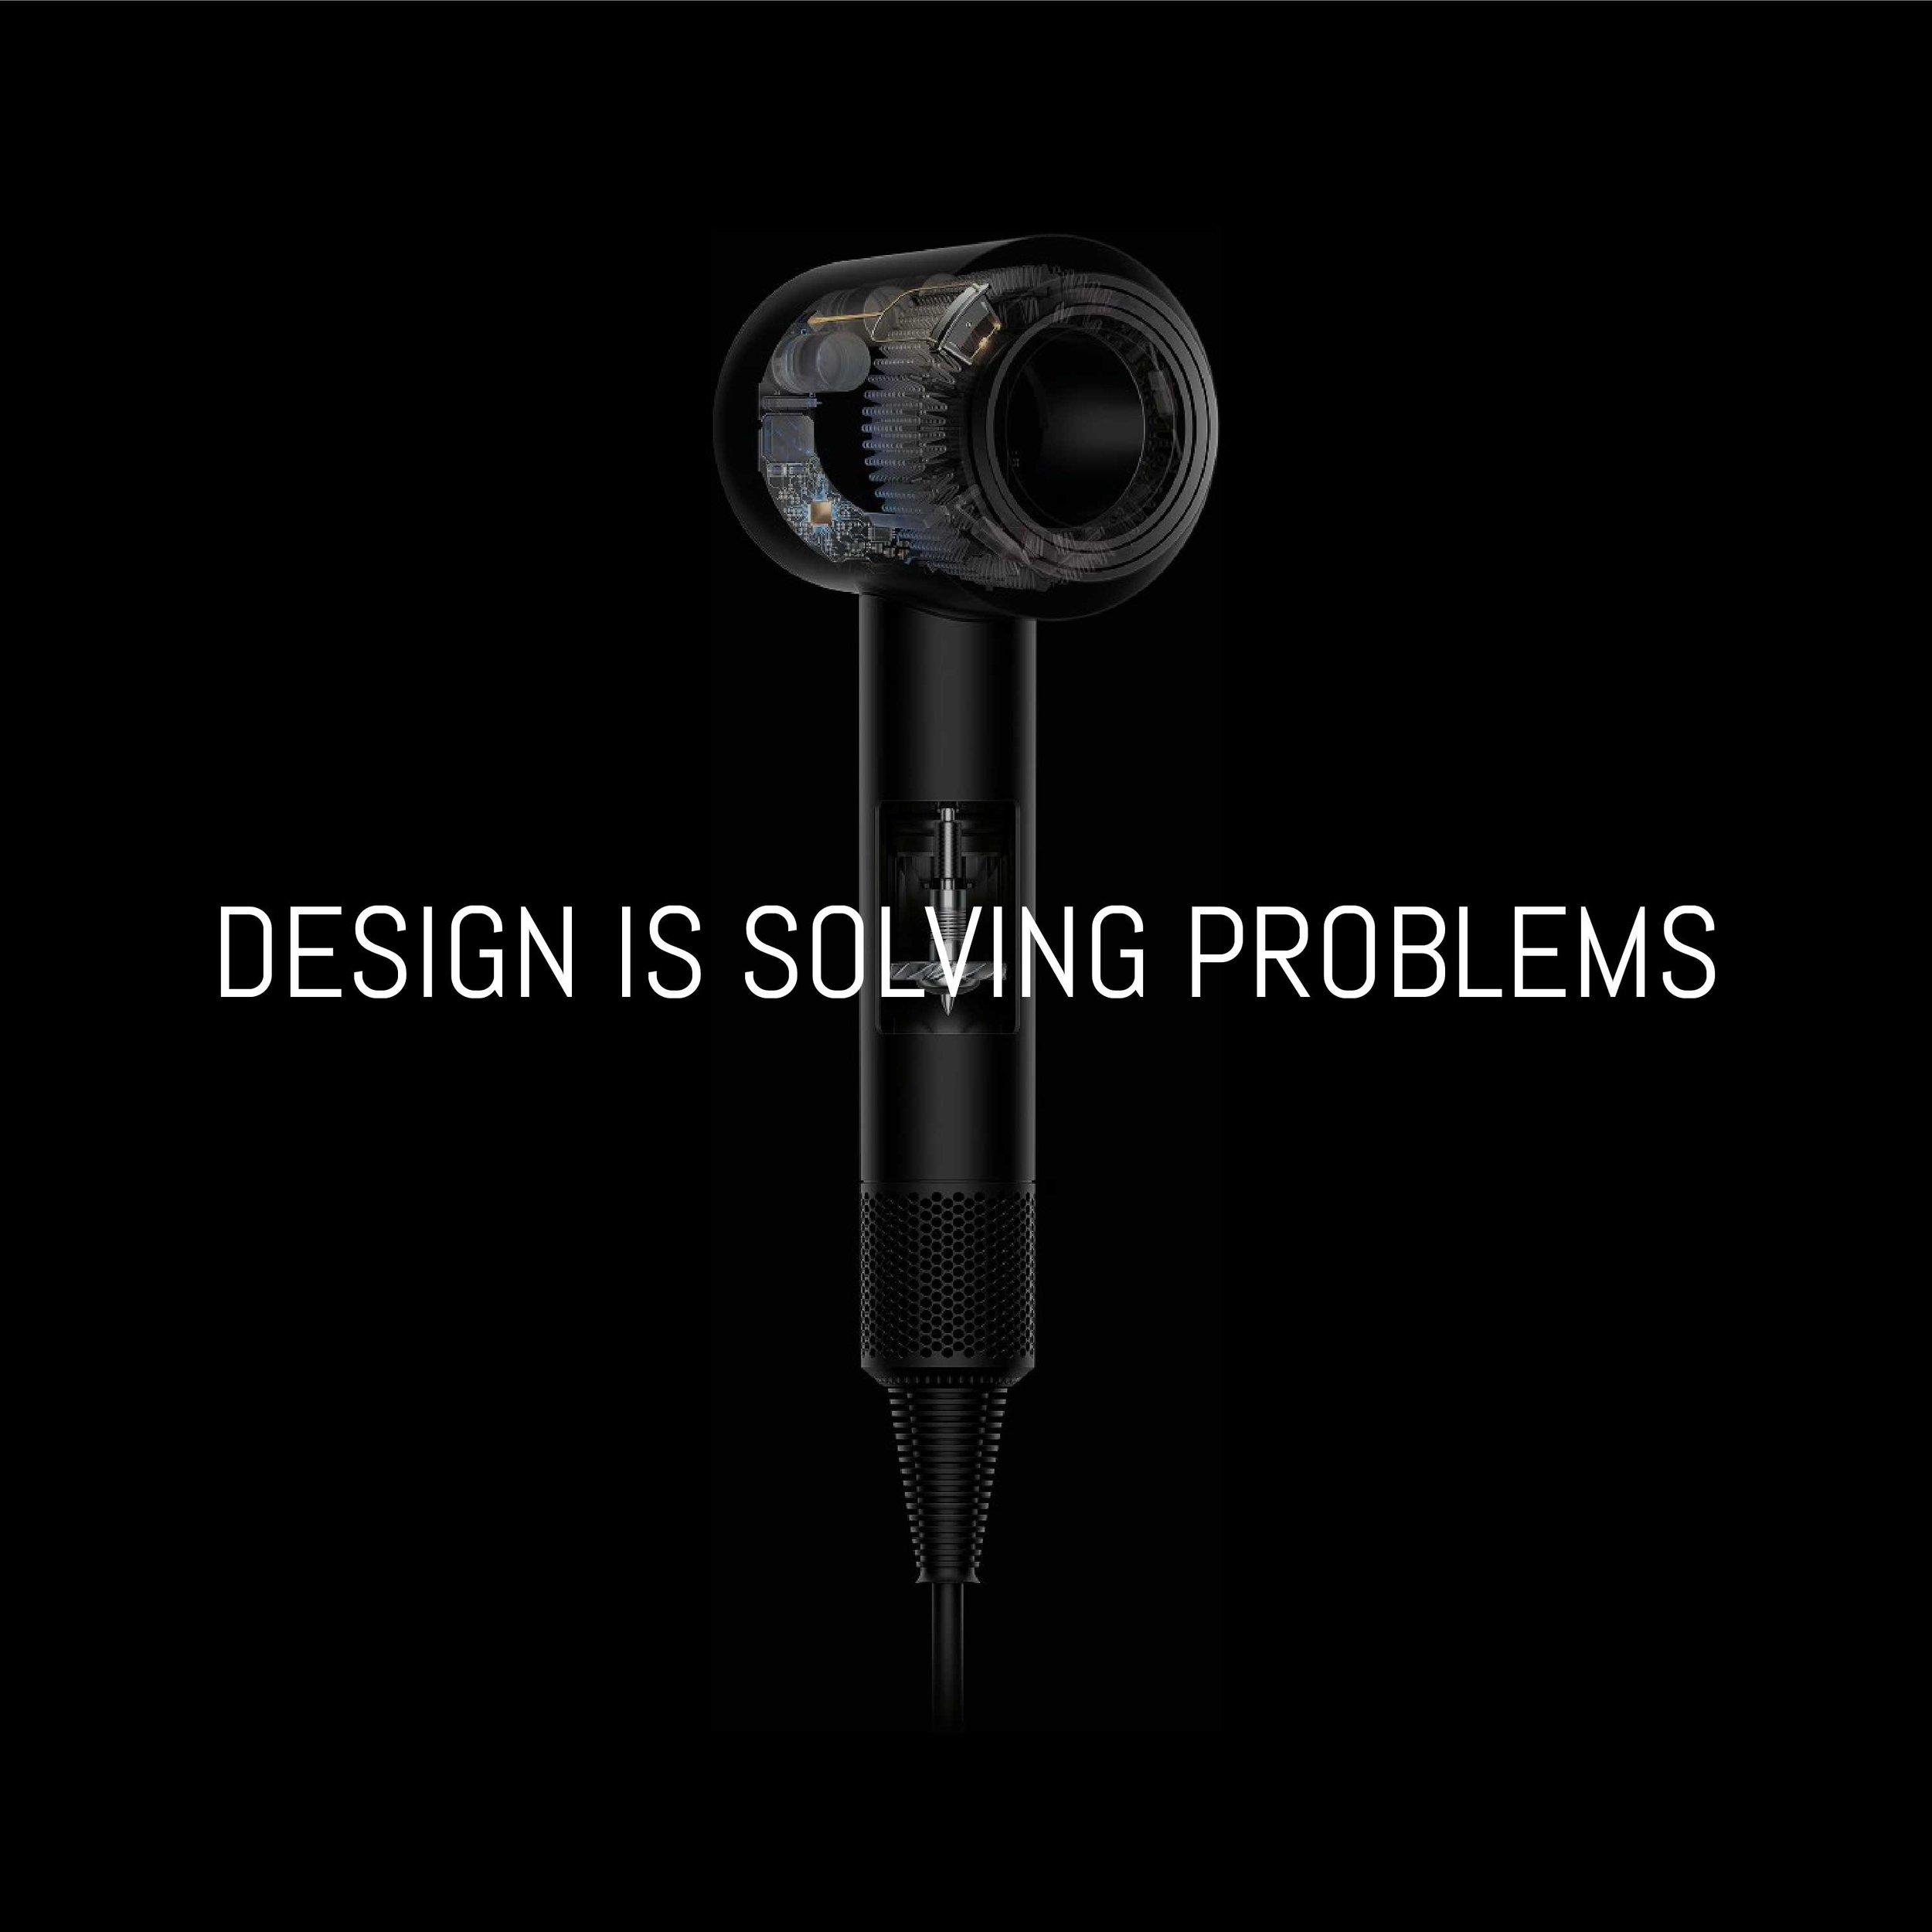 DESIGN-IS-SOLVING-PROBLEMS.jpg